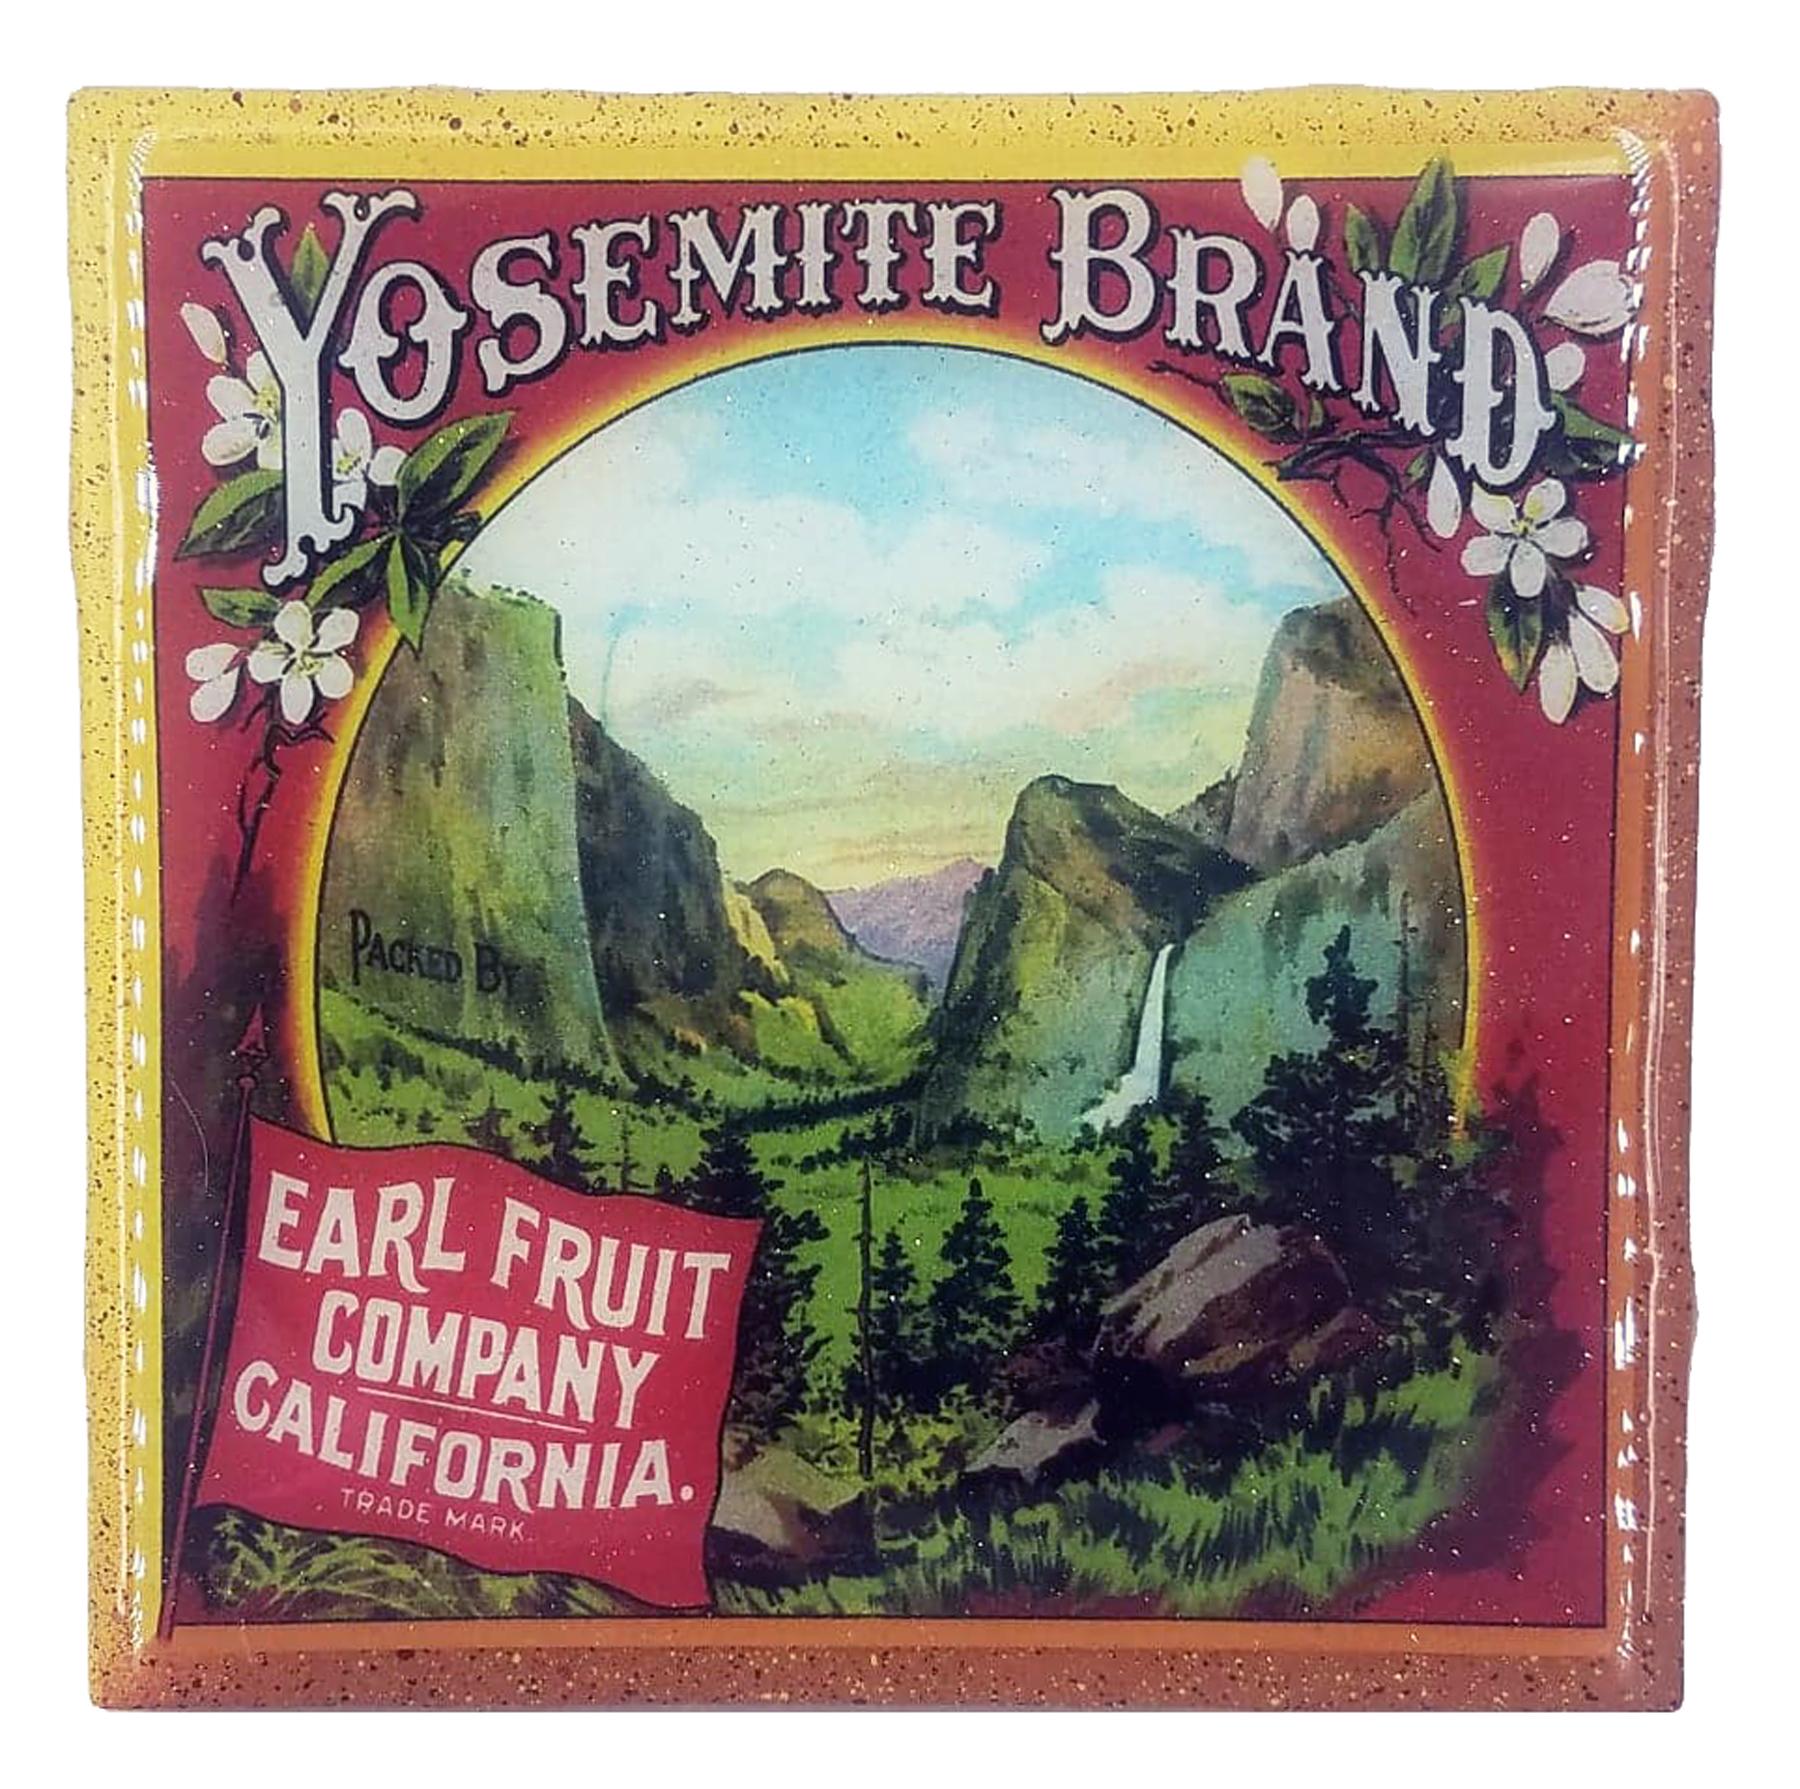 Handmade Coaster – National Parks – Yosemite Valley – Vintage Citrus Crate Label